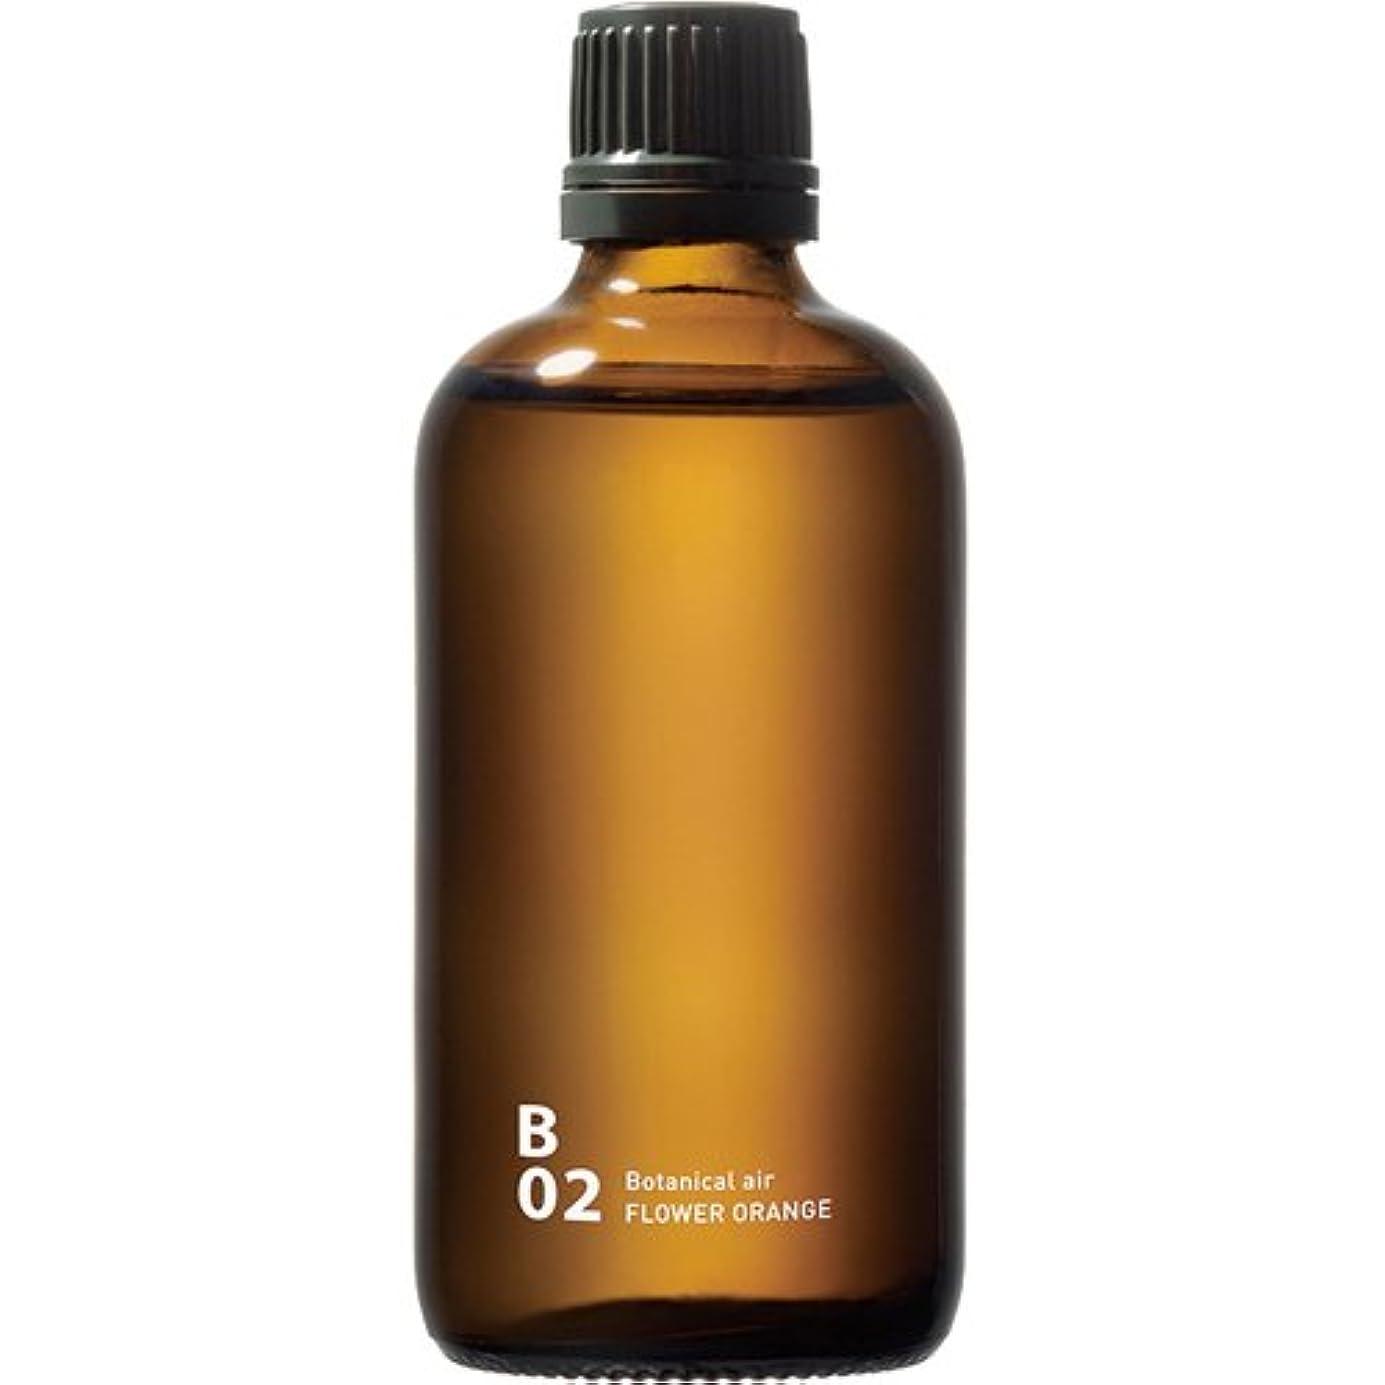 B02 FLOWER ORANGE piezo aroma oil 100ml